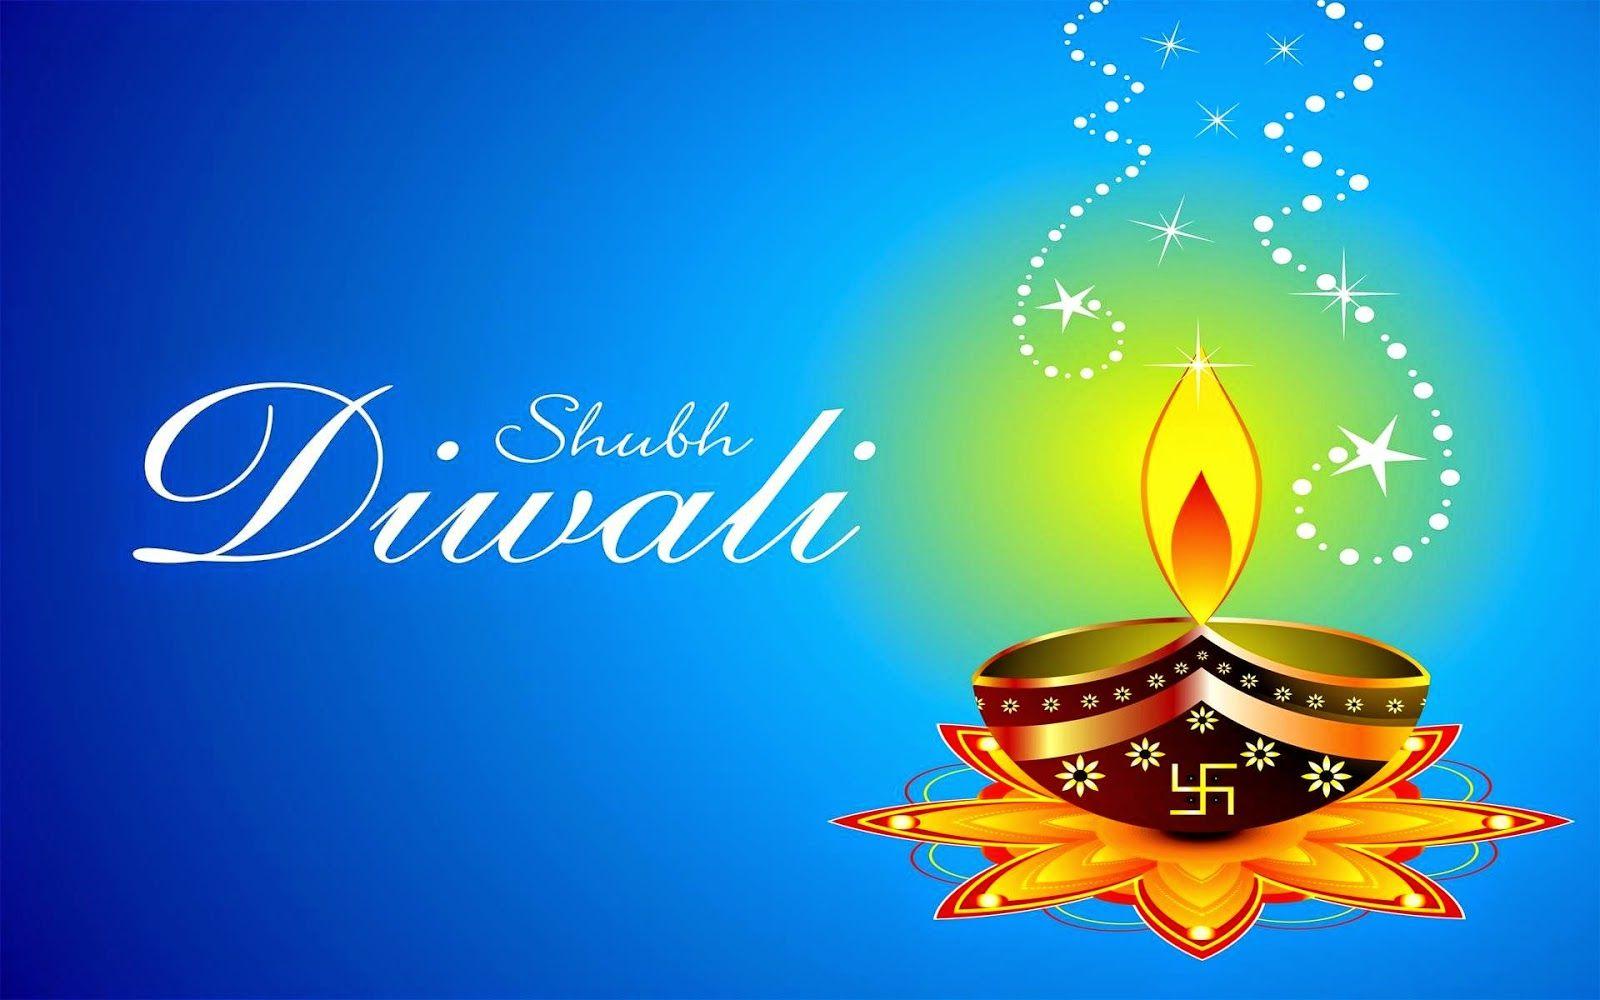 Download HD Diwali Wallpapers Free Gallery Happy diwali